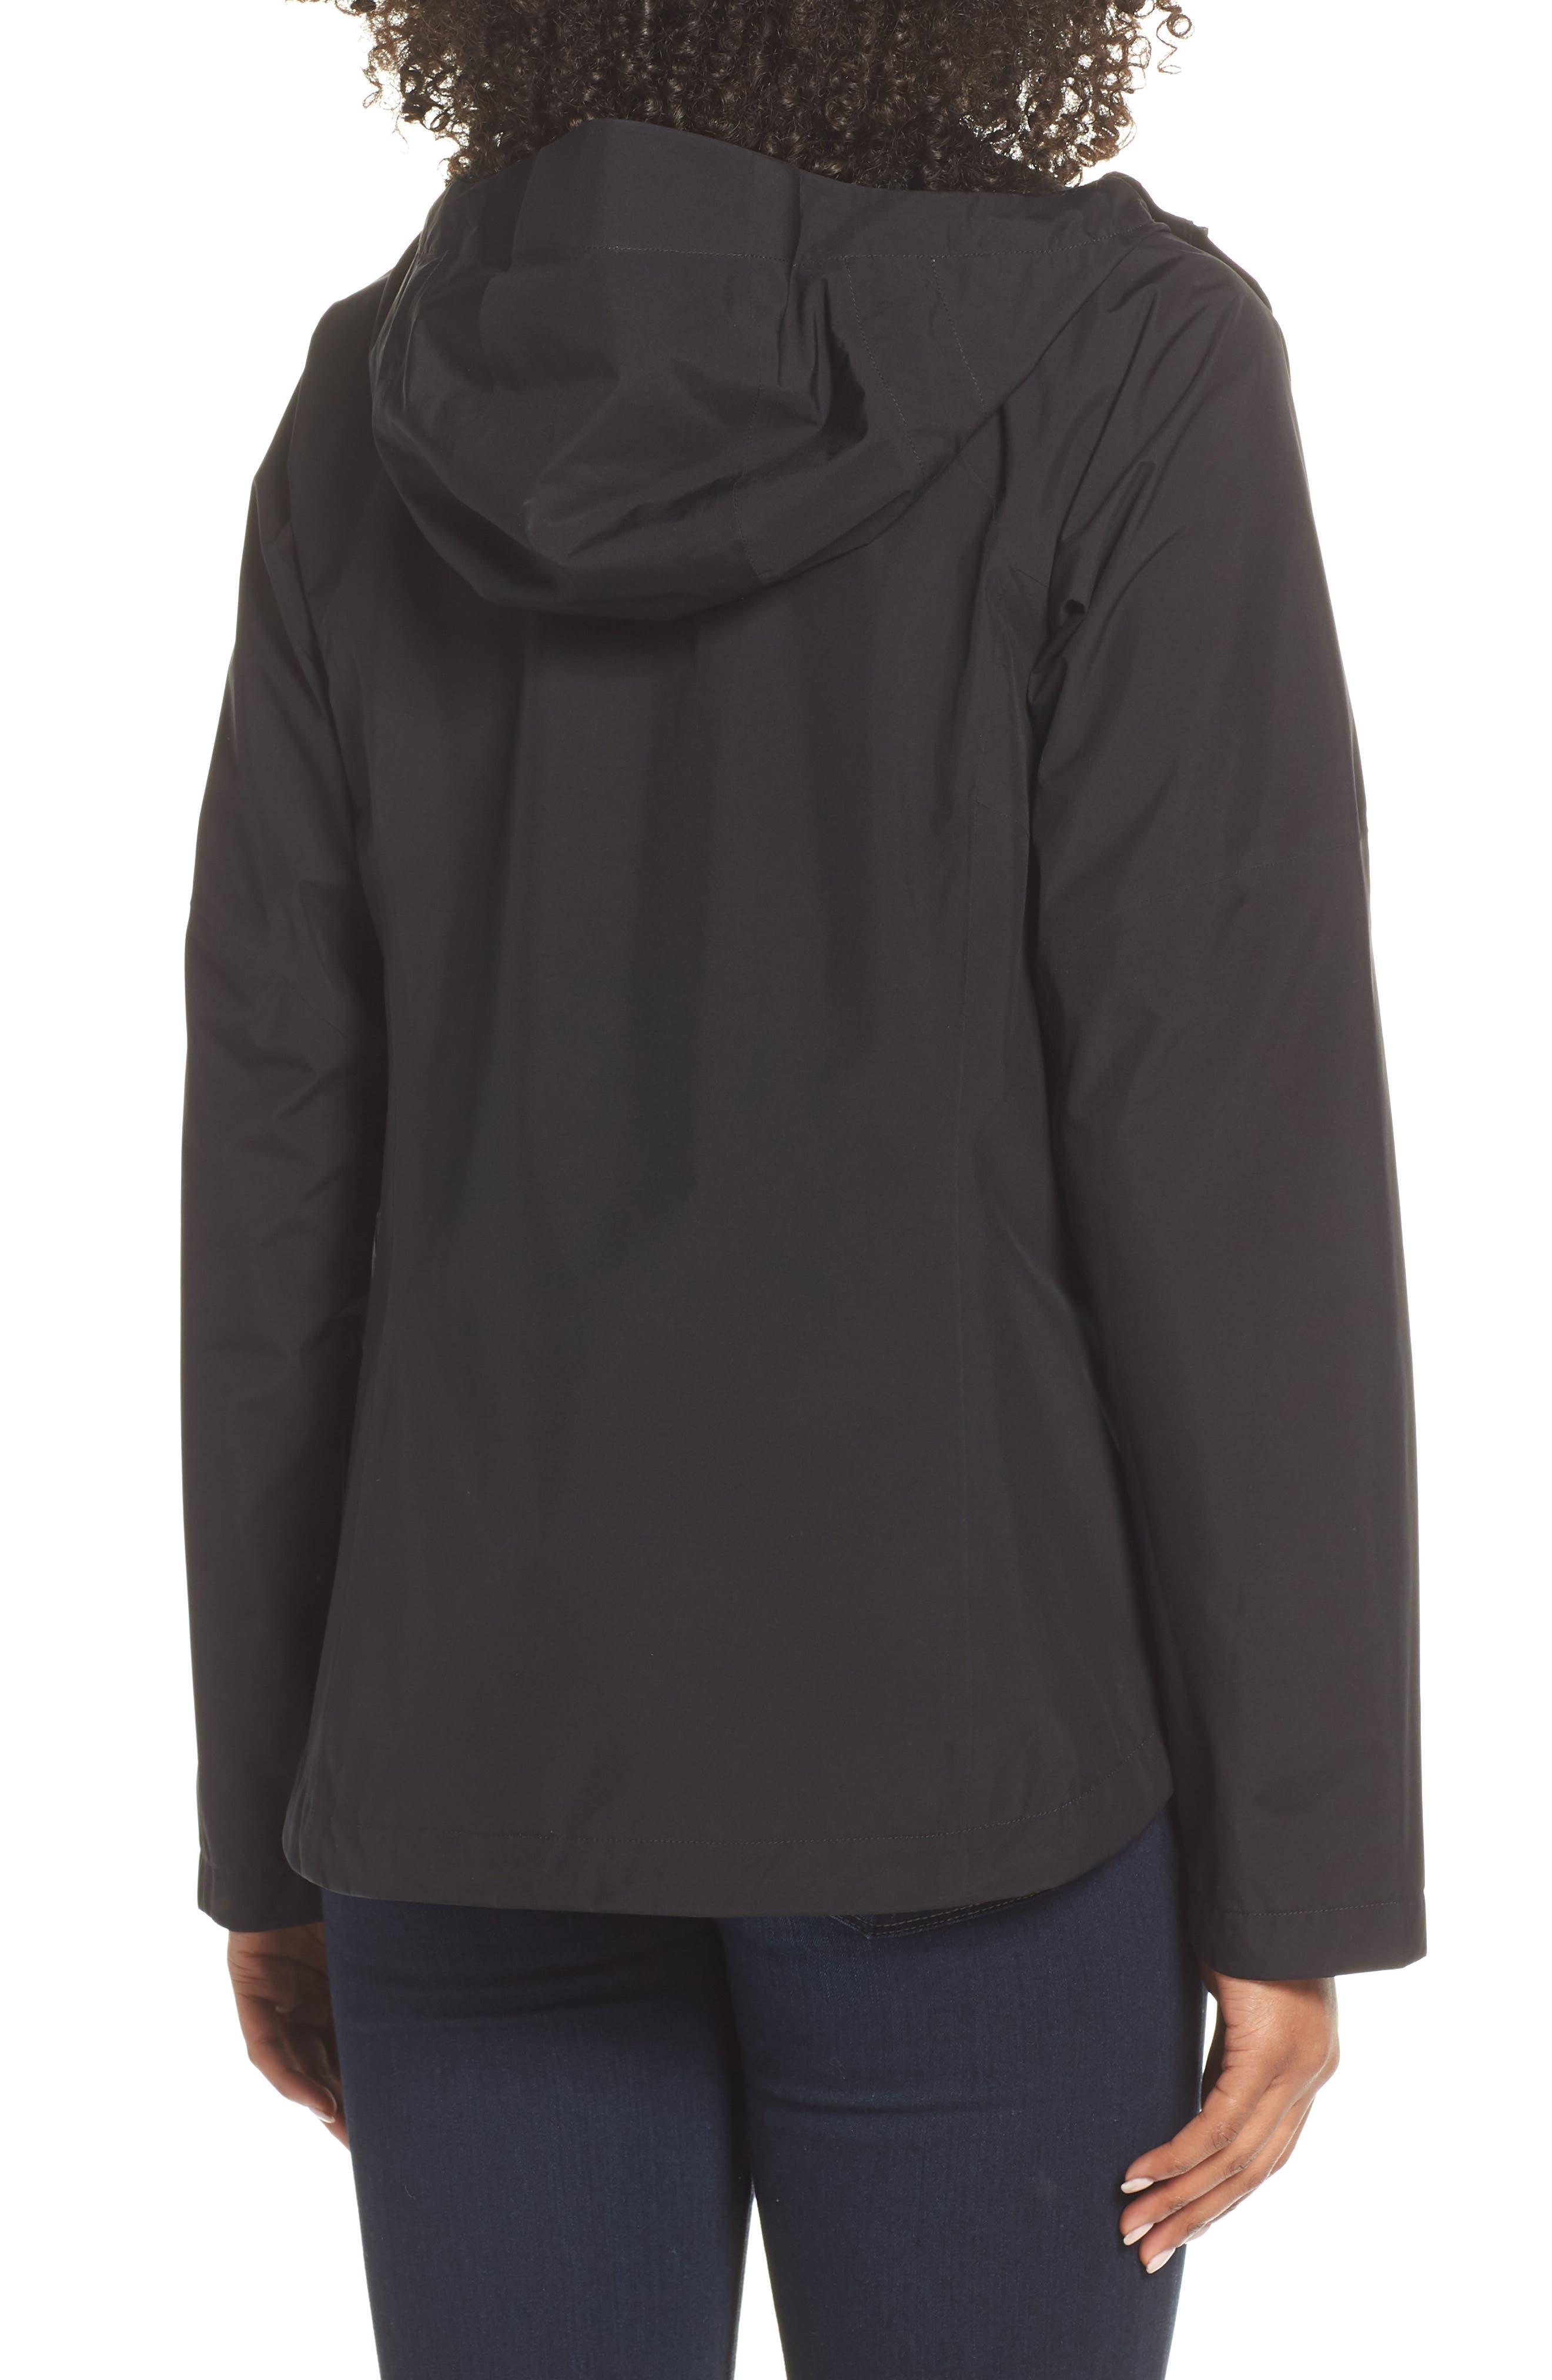 THE NORTH FACE, Dryzzle Hooded Rain Jacket, Alternate thumbnail 2, color, TNF BLACK